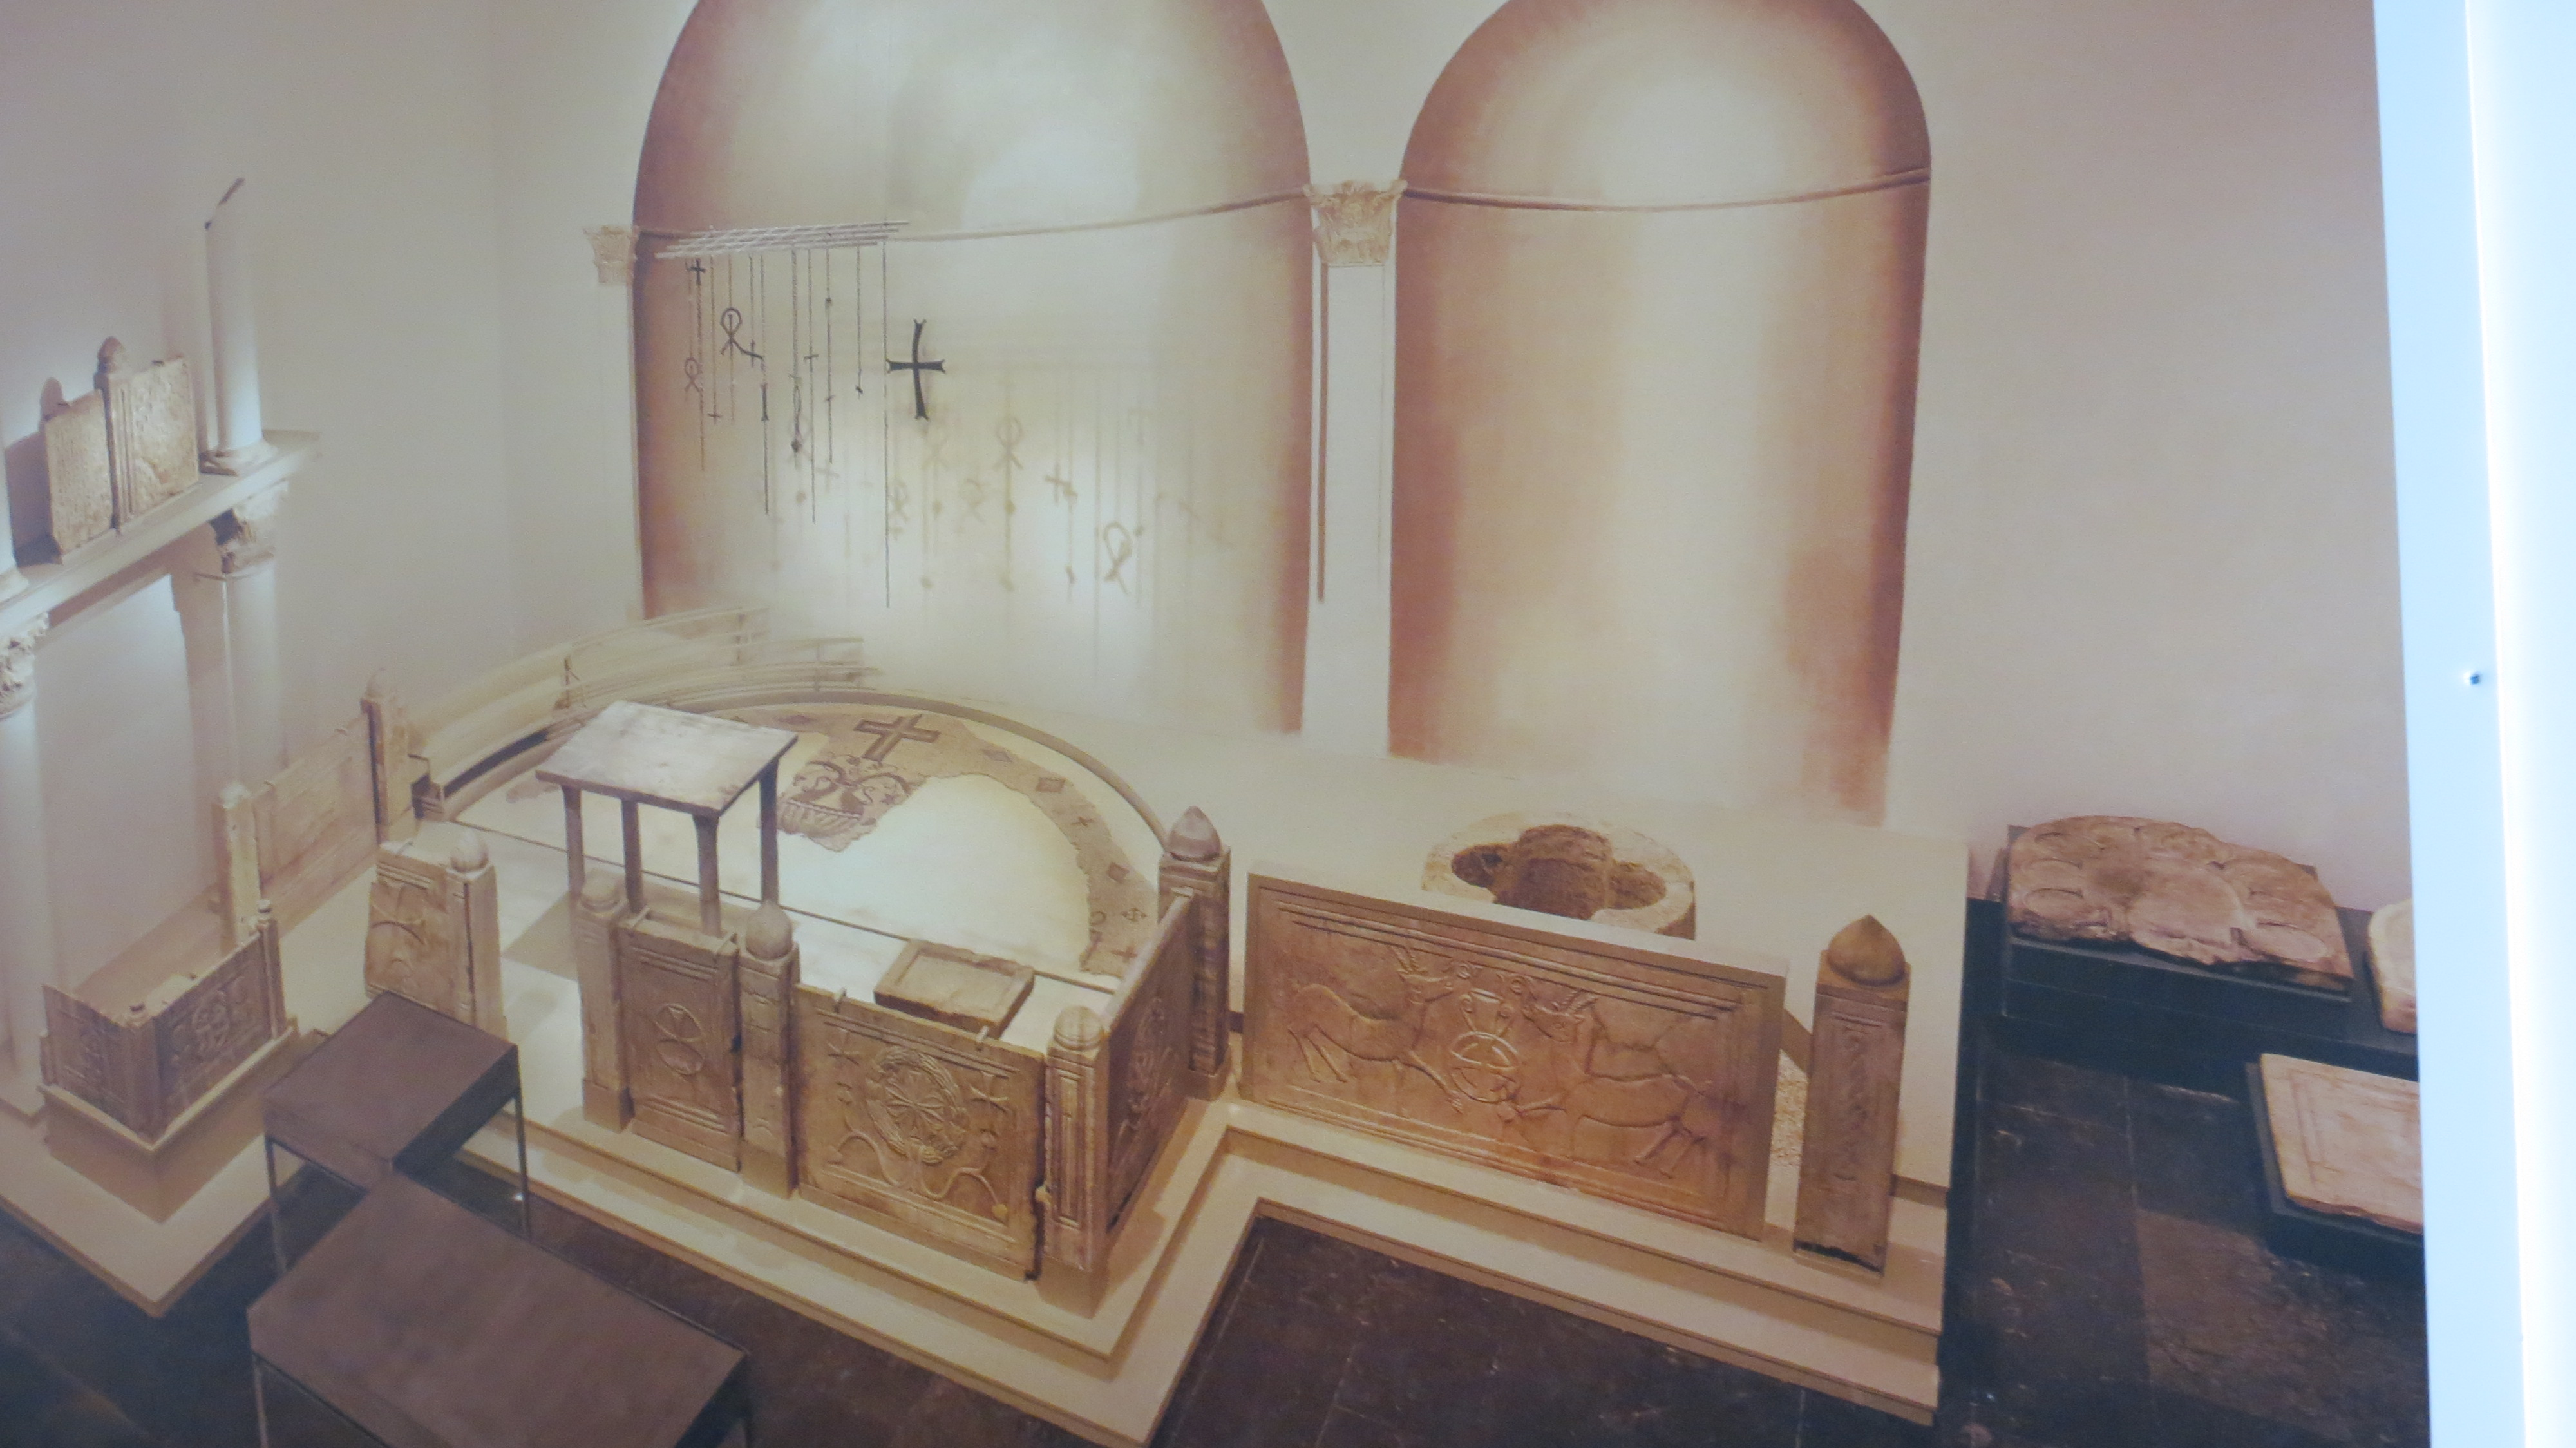 The Inn of the Good Samaritan